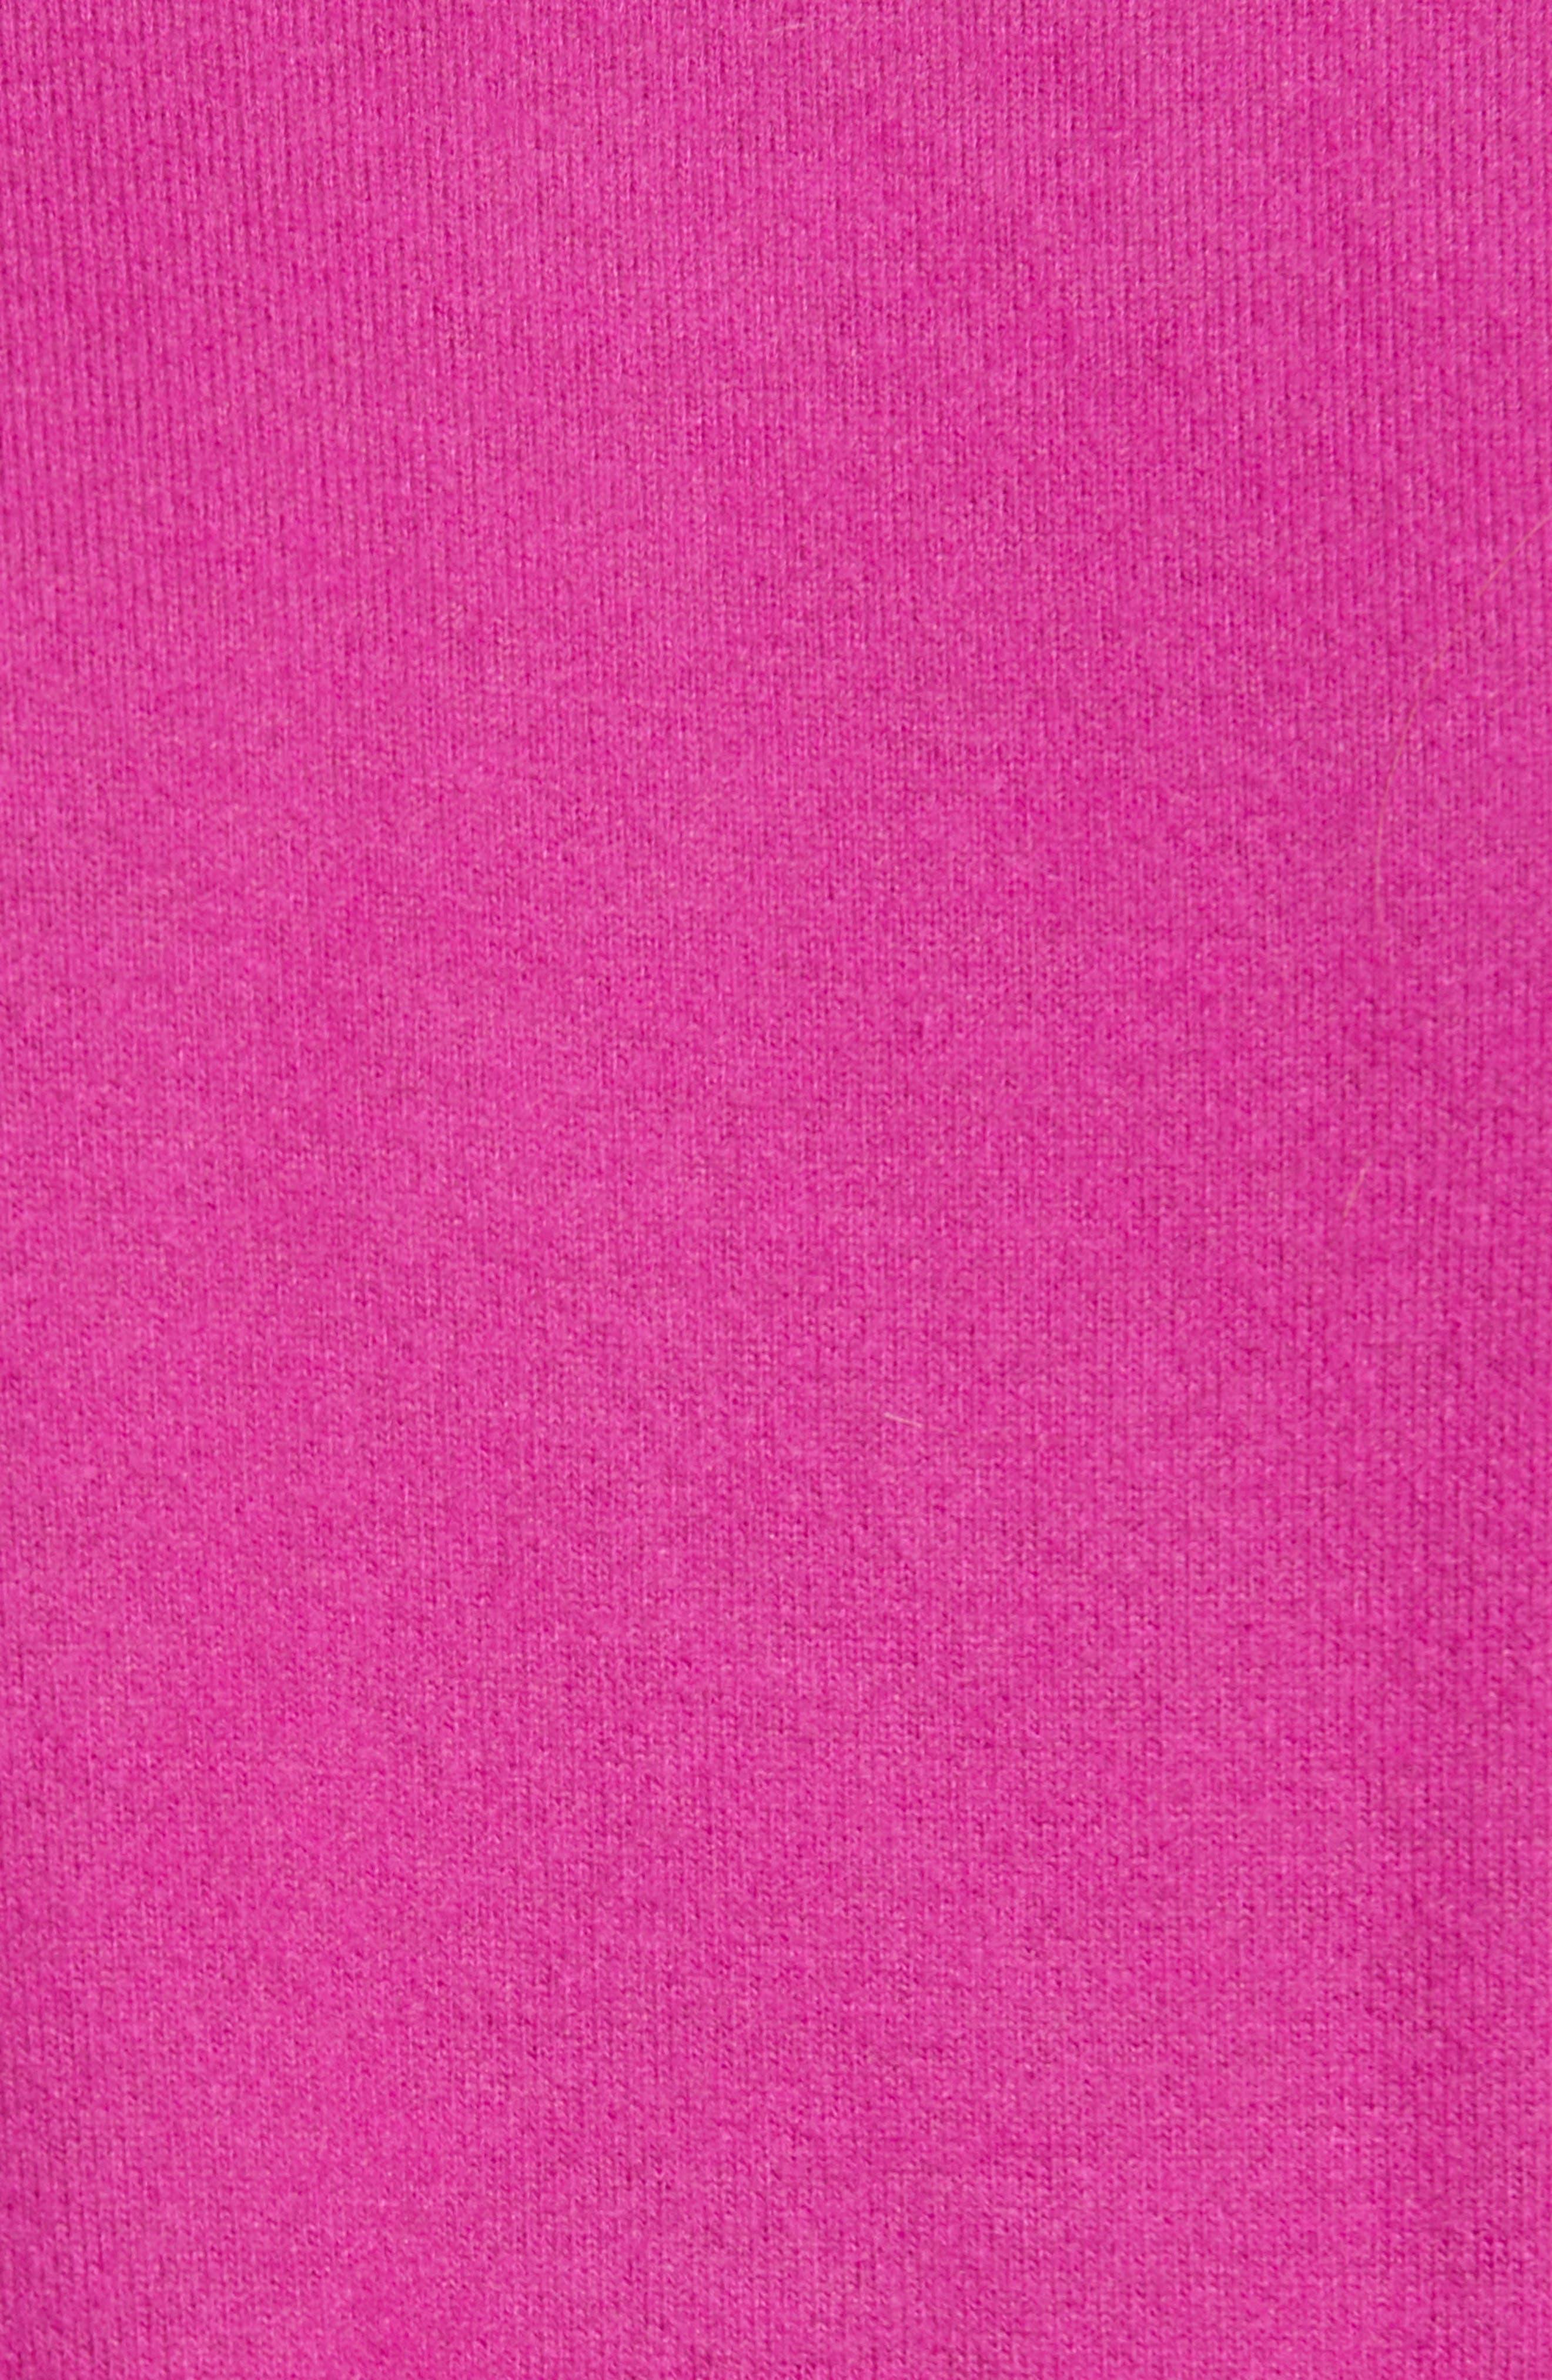 Cozy Twist Front Pullover,                             Alternate thumbnail 5, color,                             PINK VINTNER